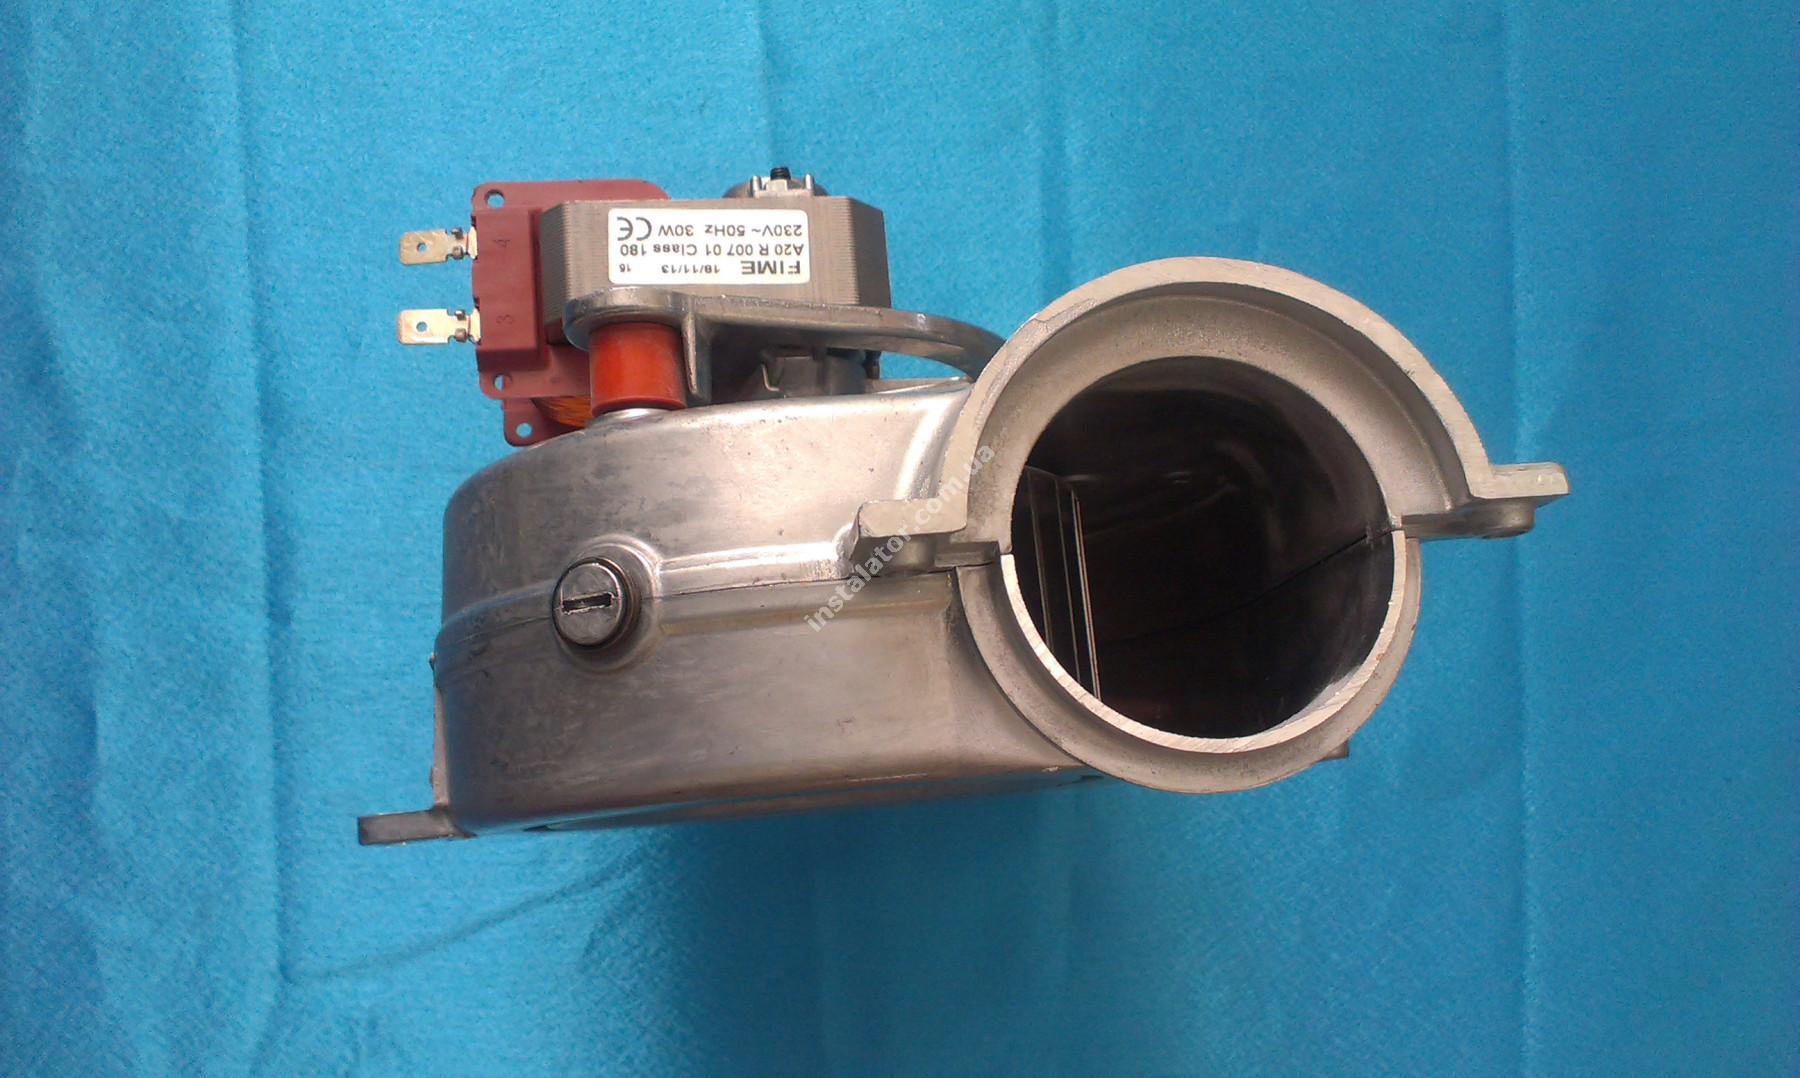 65104357  Турбіна (вентилятор) ARISTON EGIS, AS, BS, CLAS, CLAS SYSTEM full-image-2